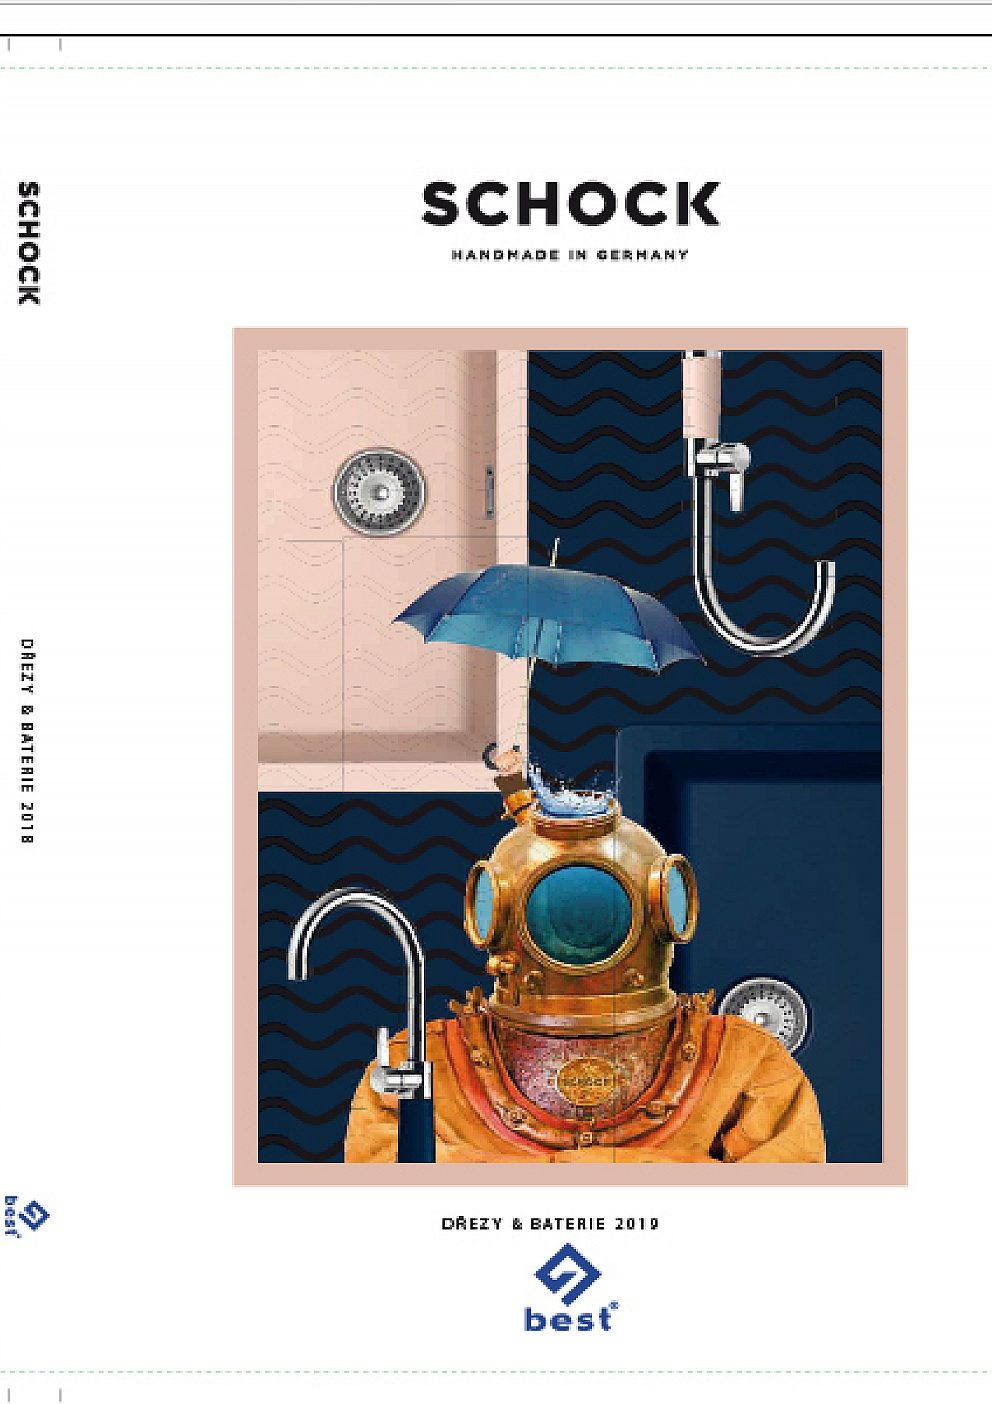 Schock - Generálny katalóg 2019